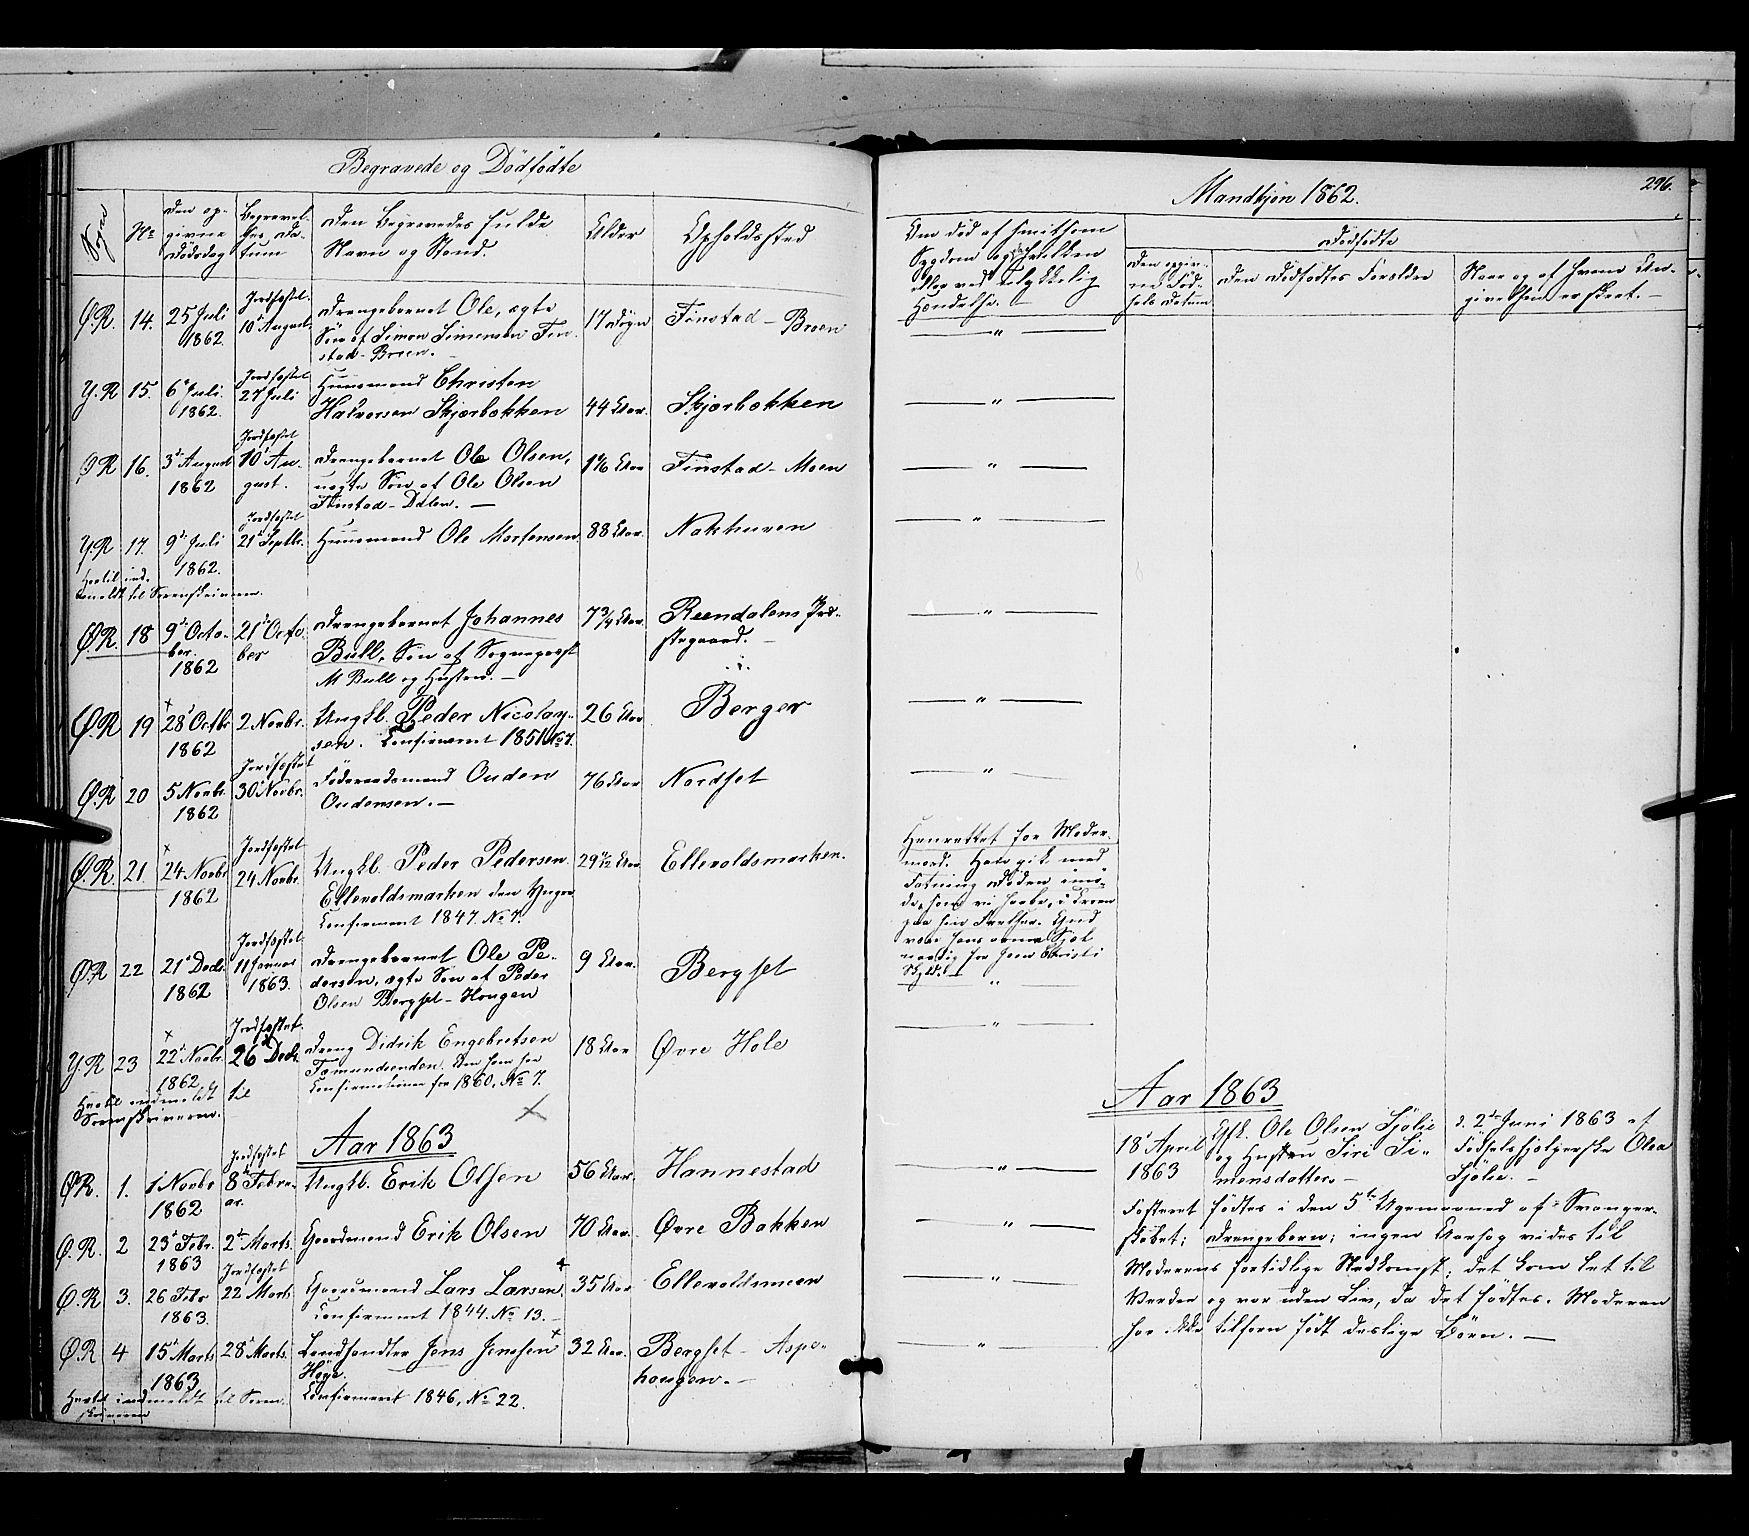 SAH, Rendalen prestekontor, H/Ha/Haa/L0005: Ministerialbok nr. 5, 1853-1866, s. 296